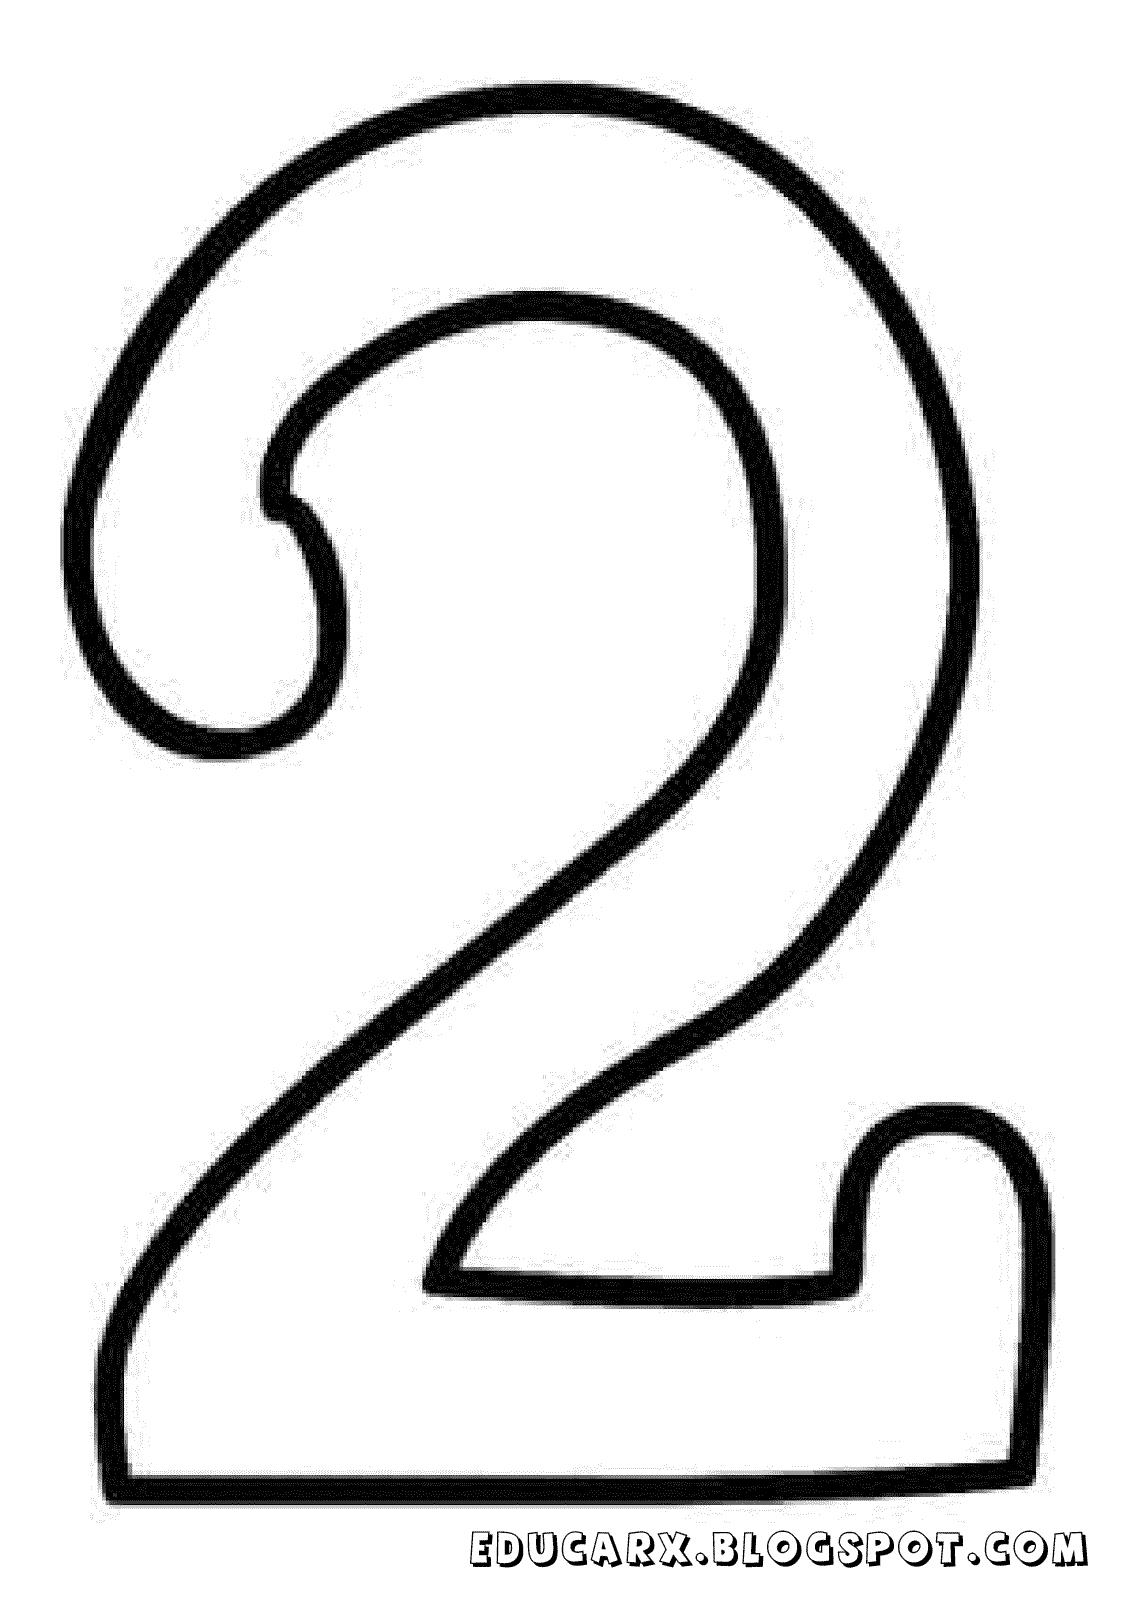 Molde do numero 2